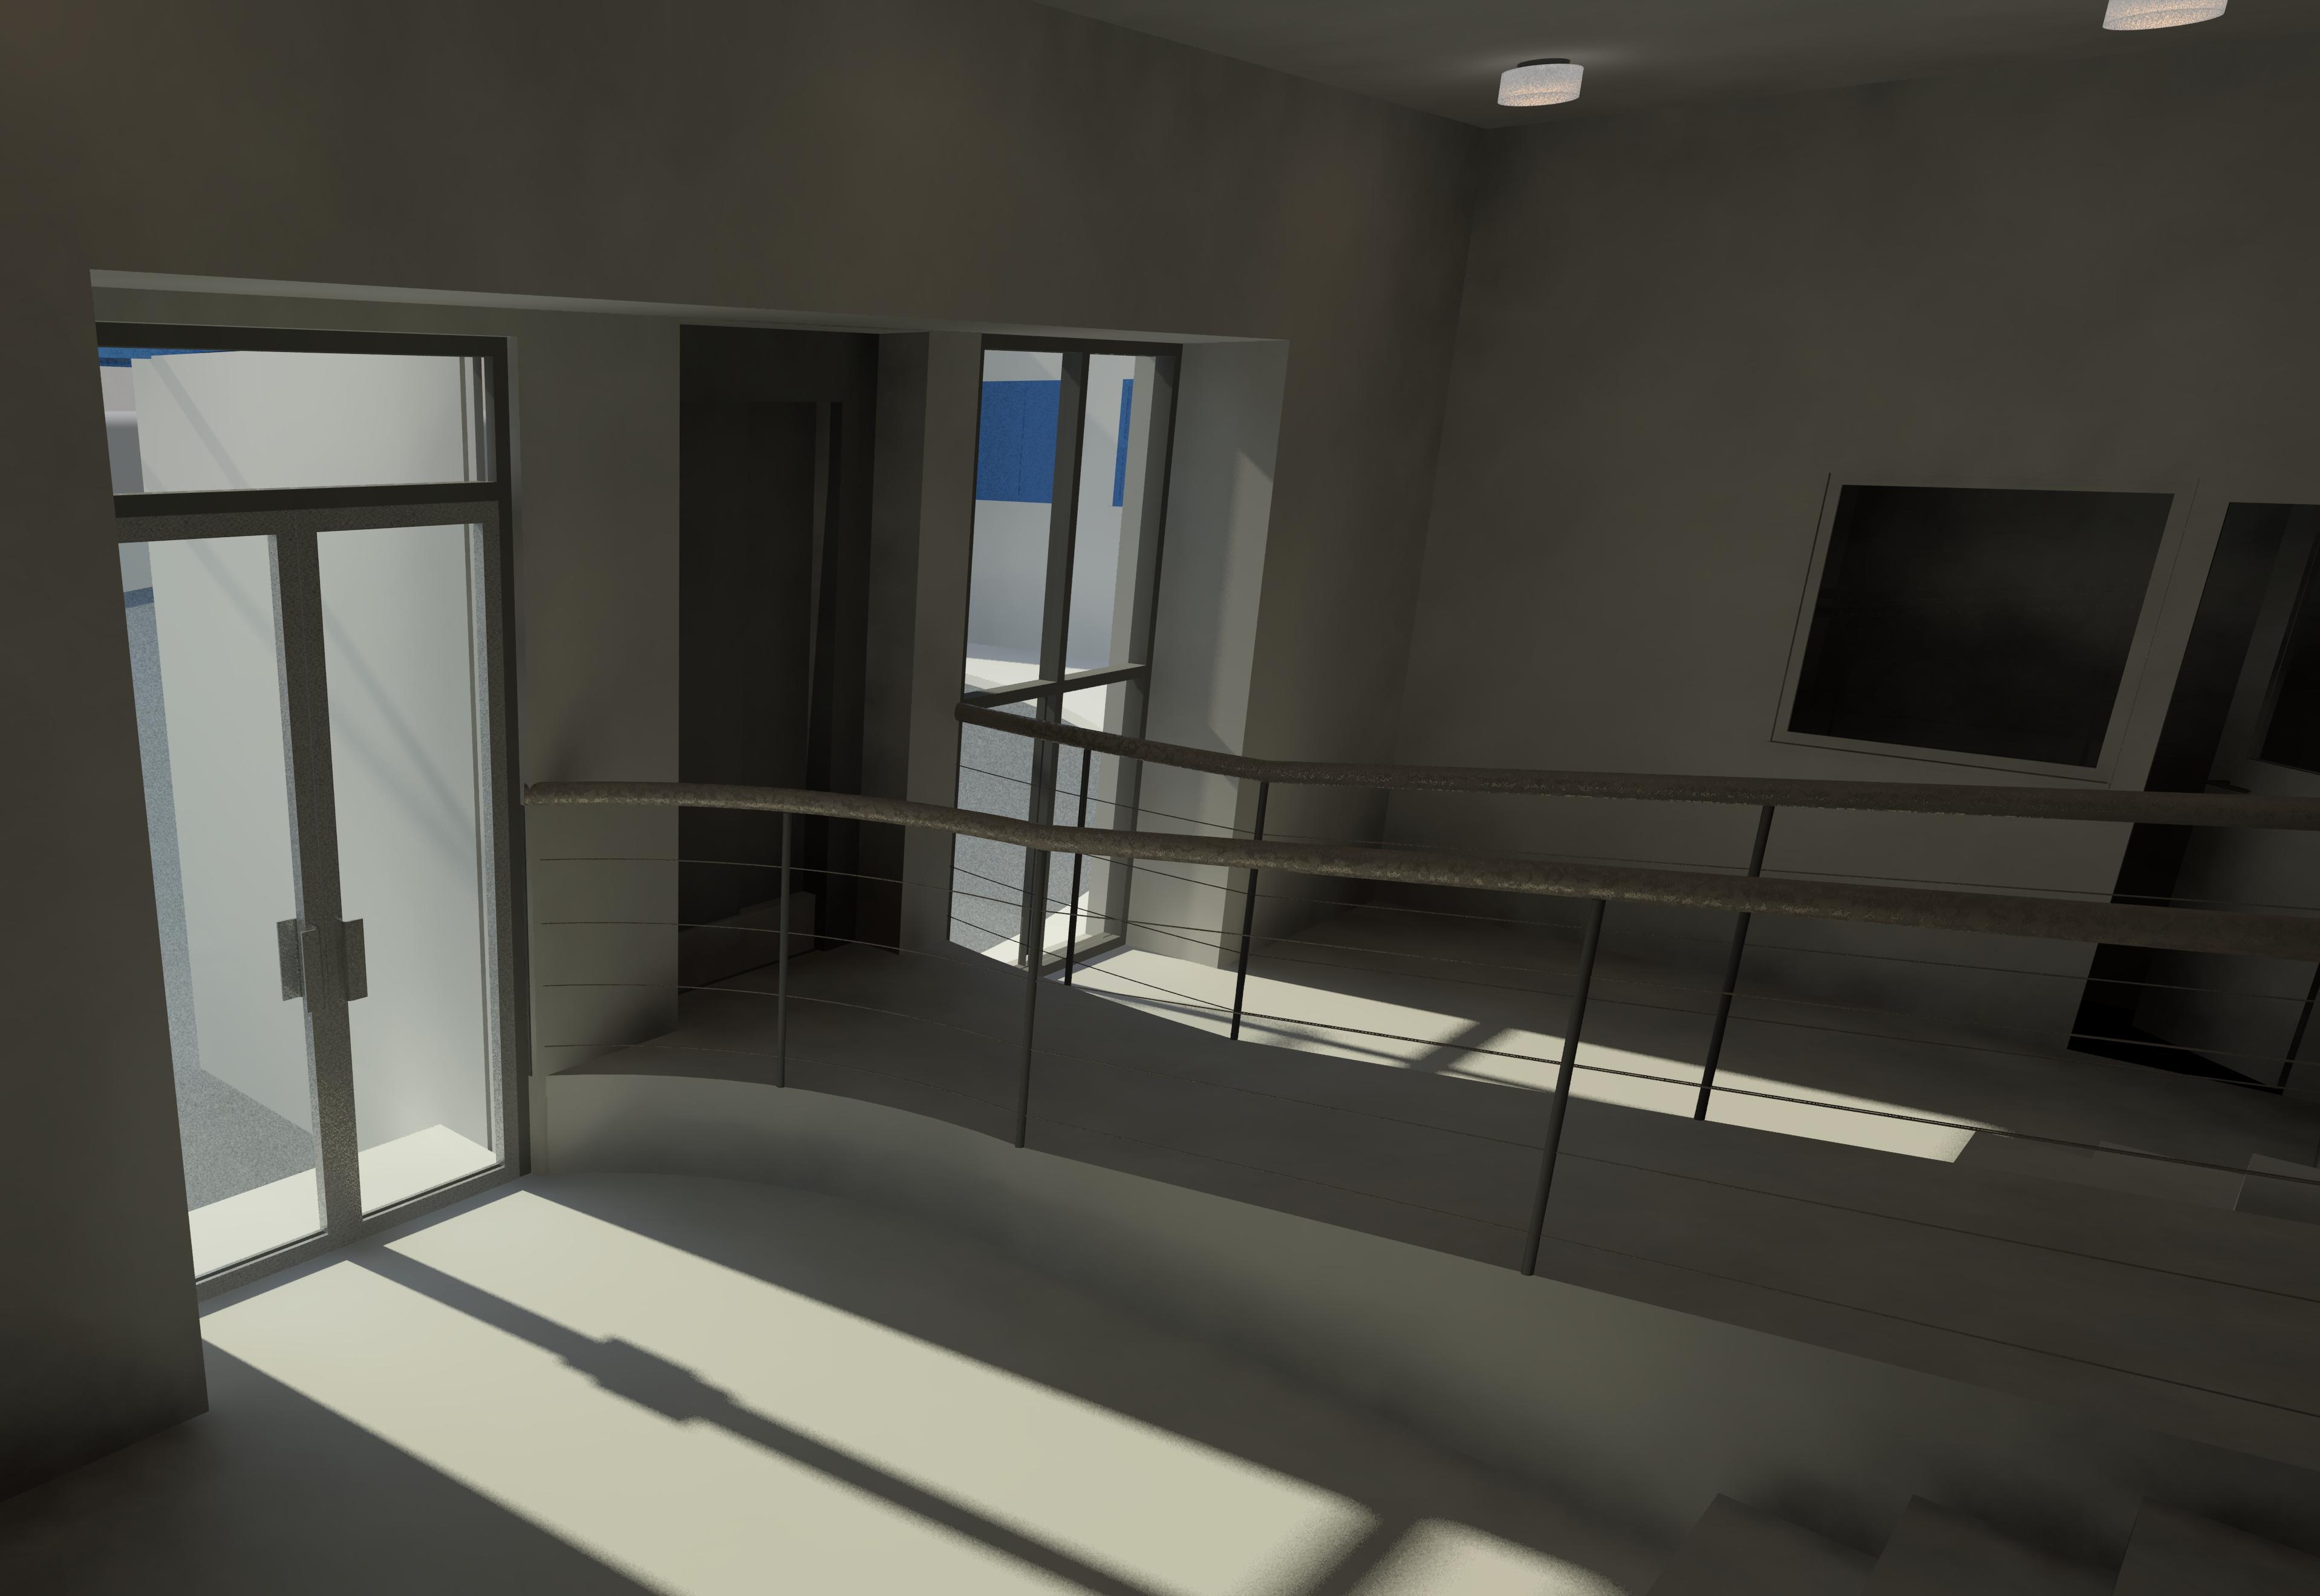 Solución 1 Perspectiva Portal 02